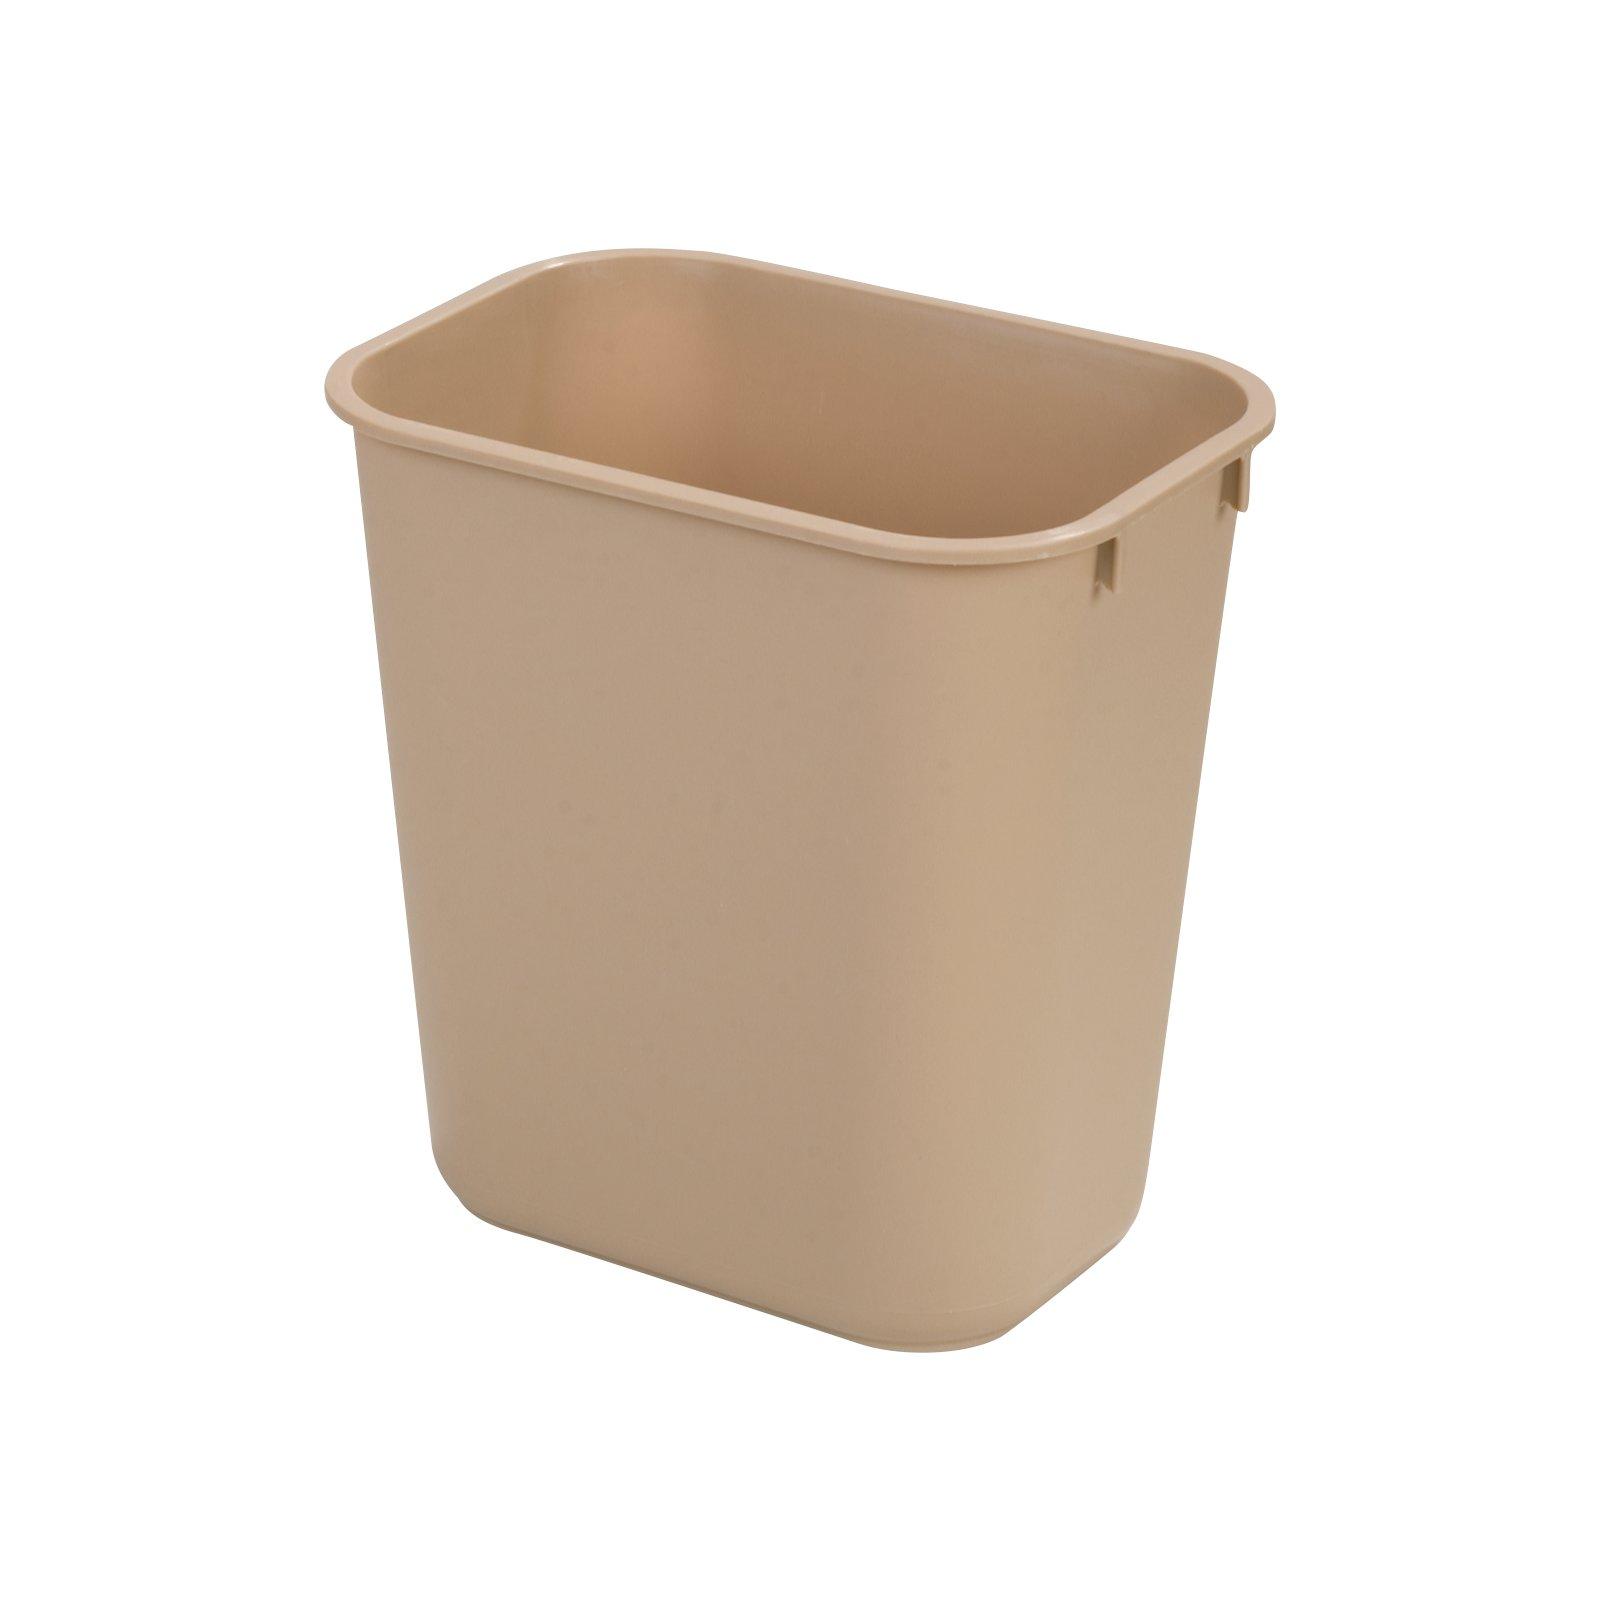 Charmant 34292806   Rectangle Office Wastebasket Trash Can 28 Quart   Beige